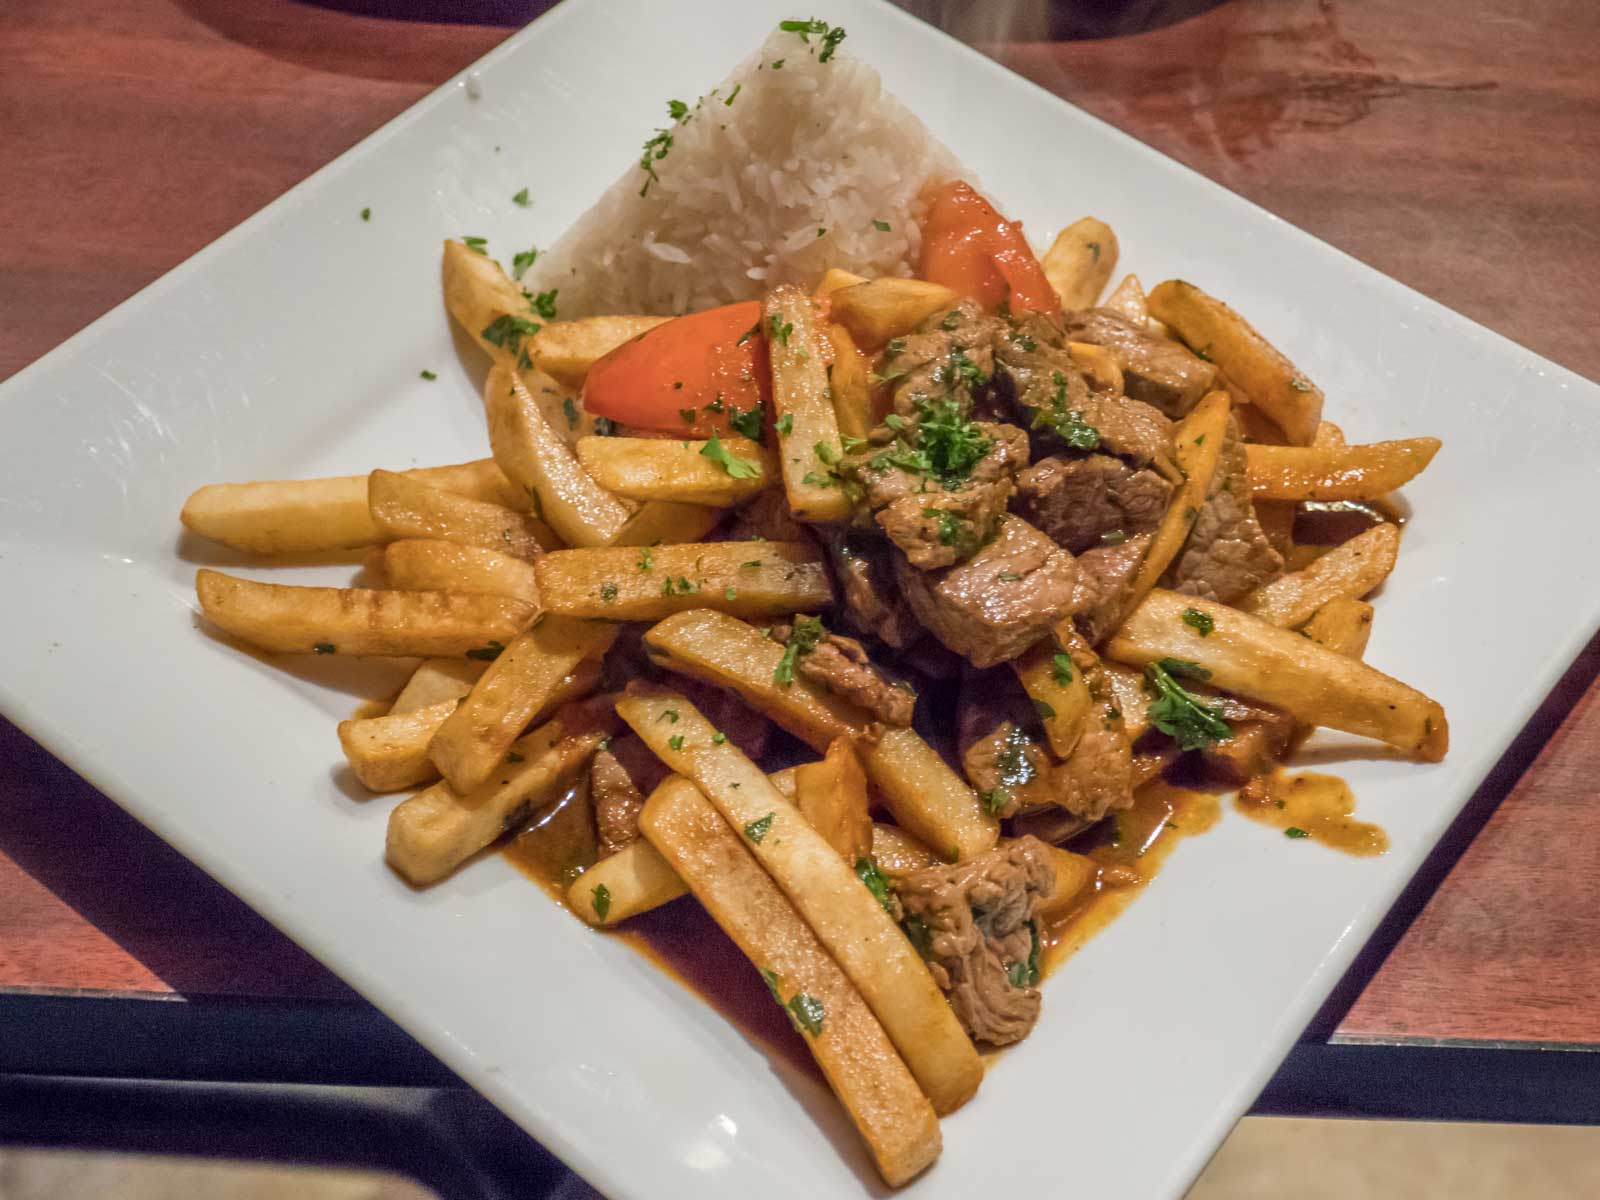 lomo-saltado-at-El-Chullo-Peruvian-Cuisine-Phoenix-Arizona